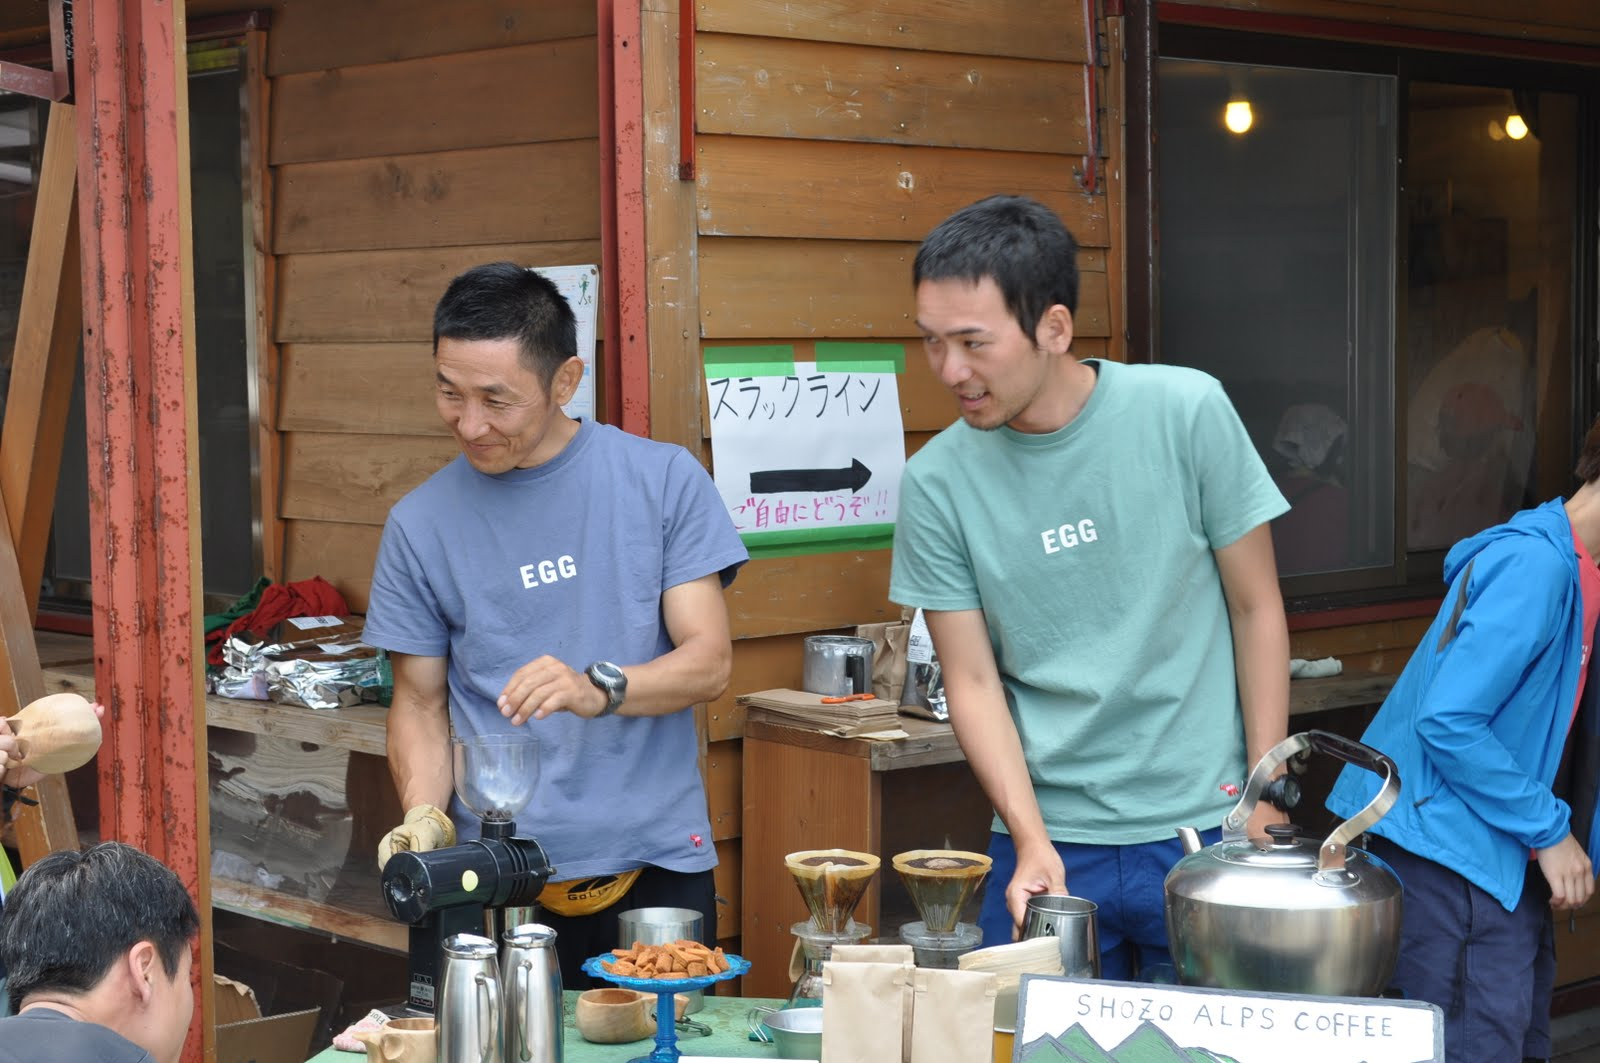 News: SHOZO ALPS COFFEE